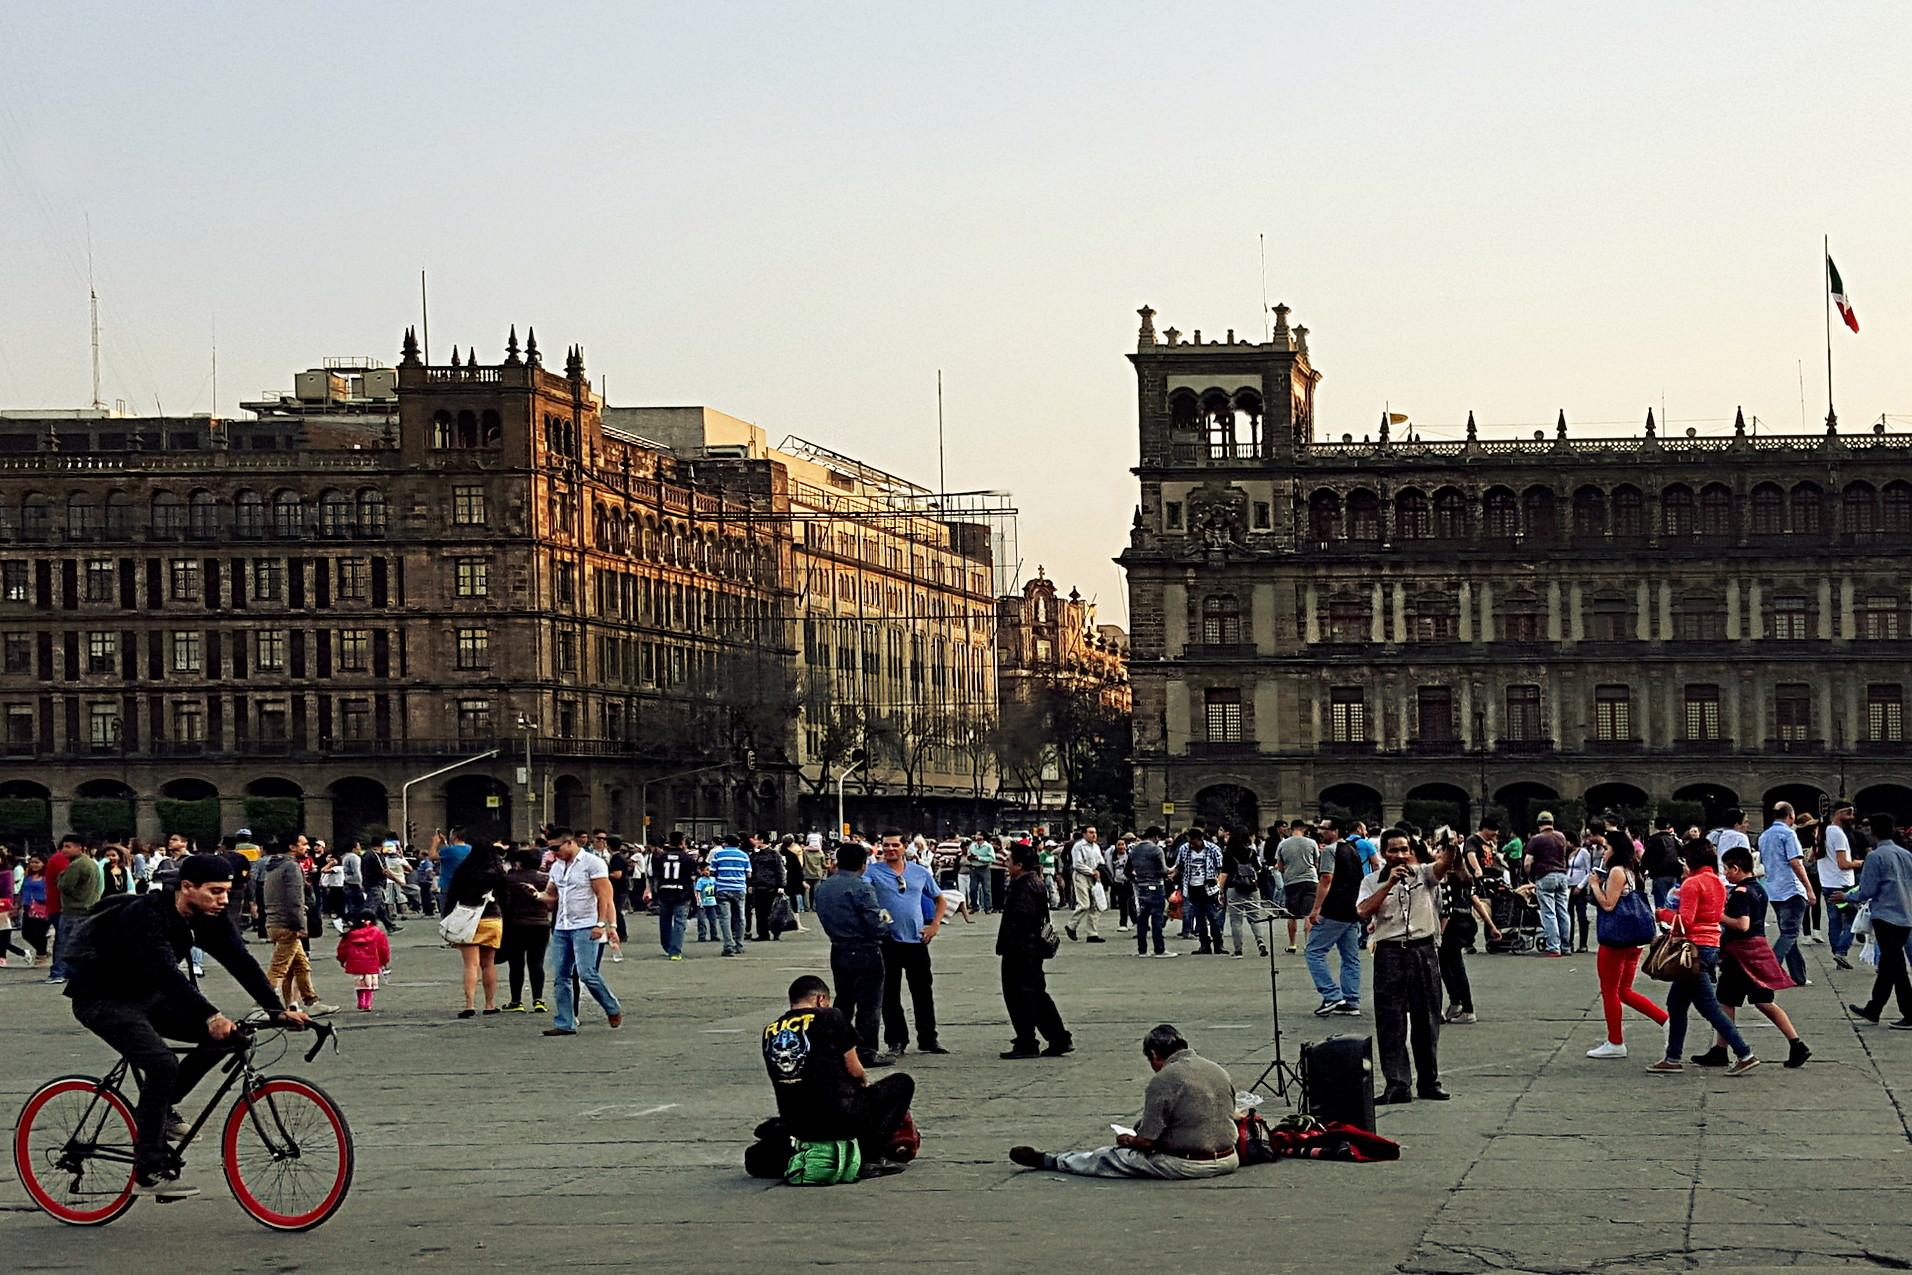 Mexico City's main square